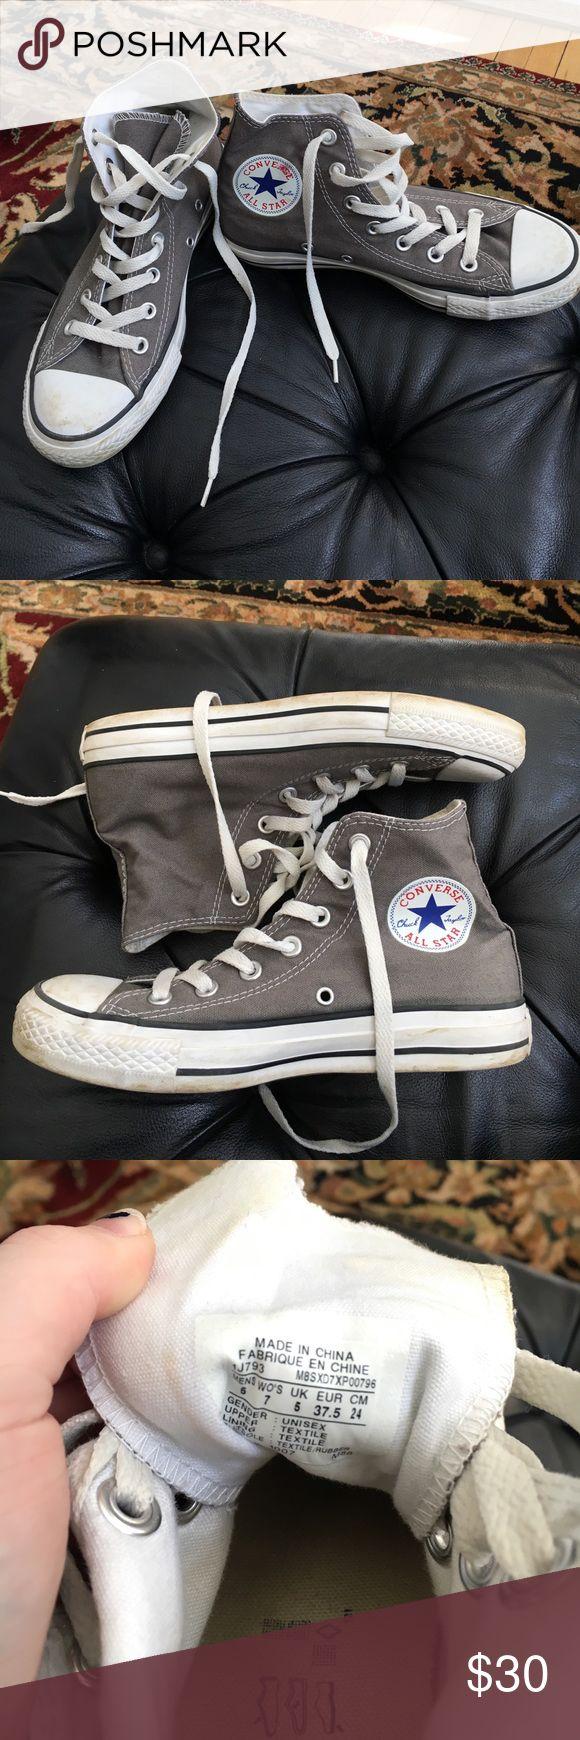 Grey high top converse gently worn grey high top converse size 7 women Converse Shoes Sneakers